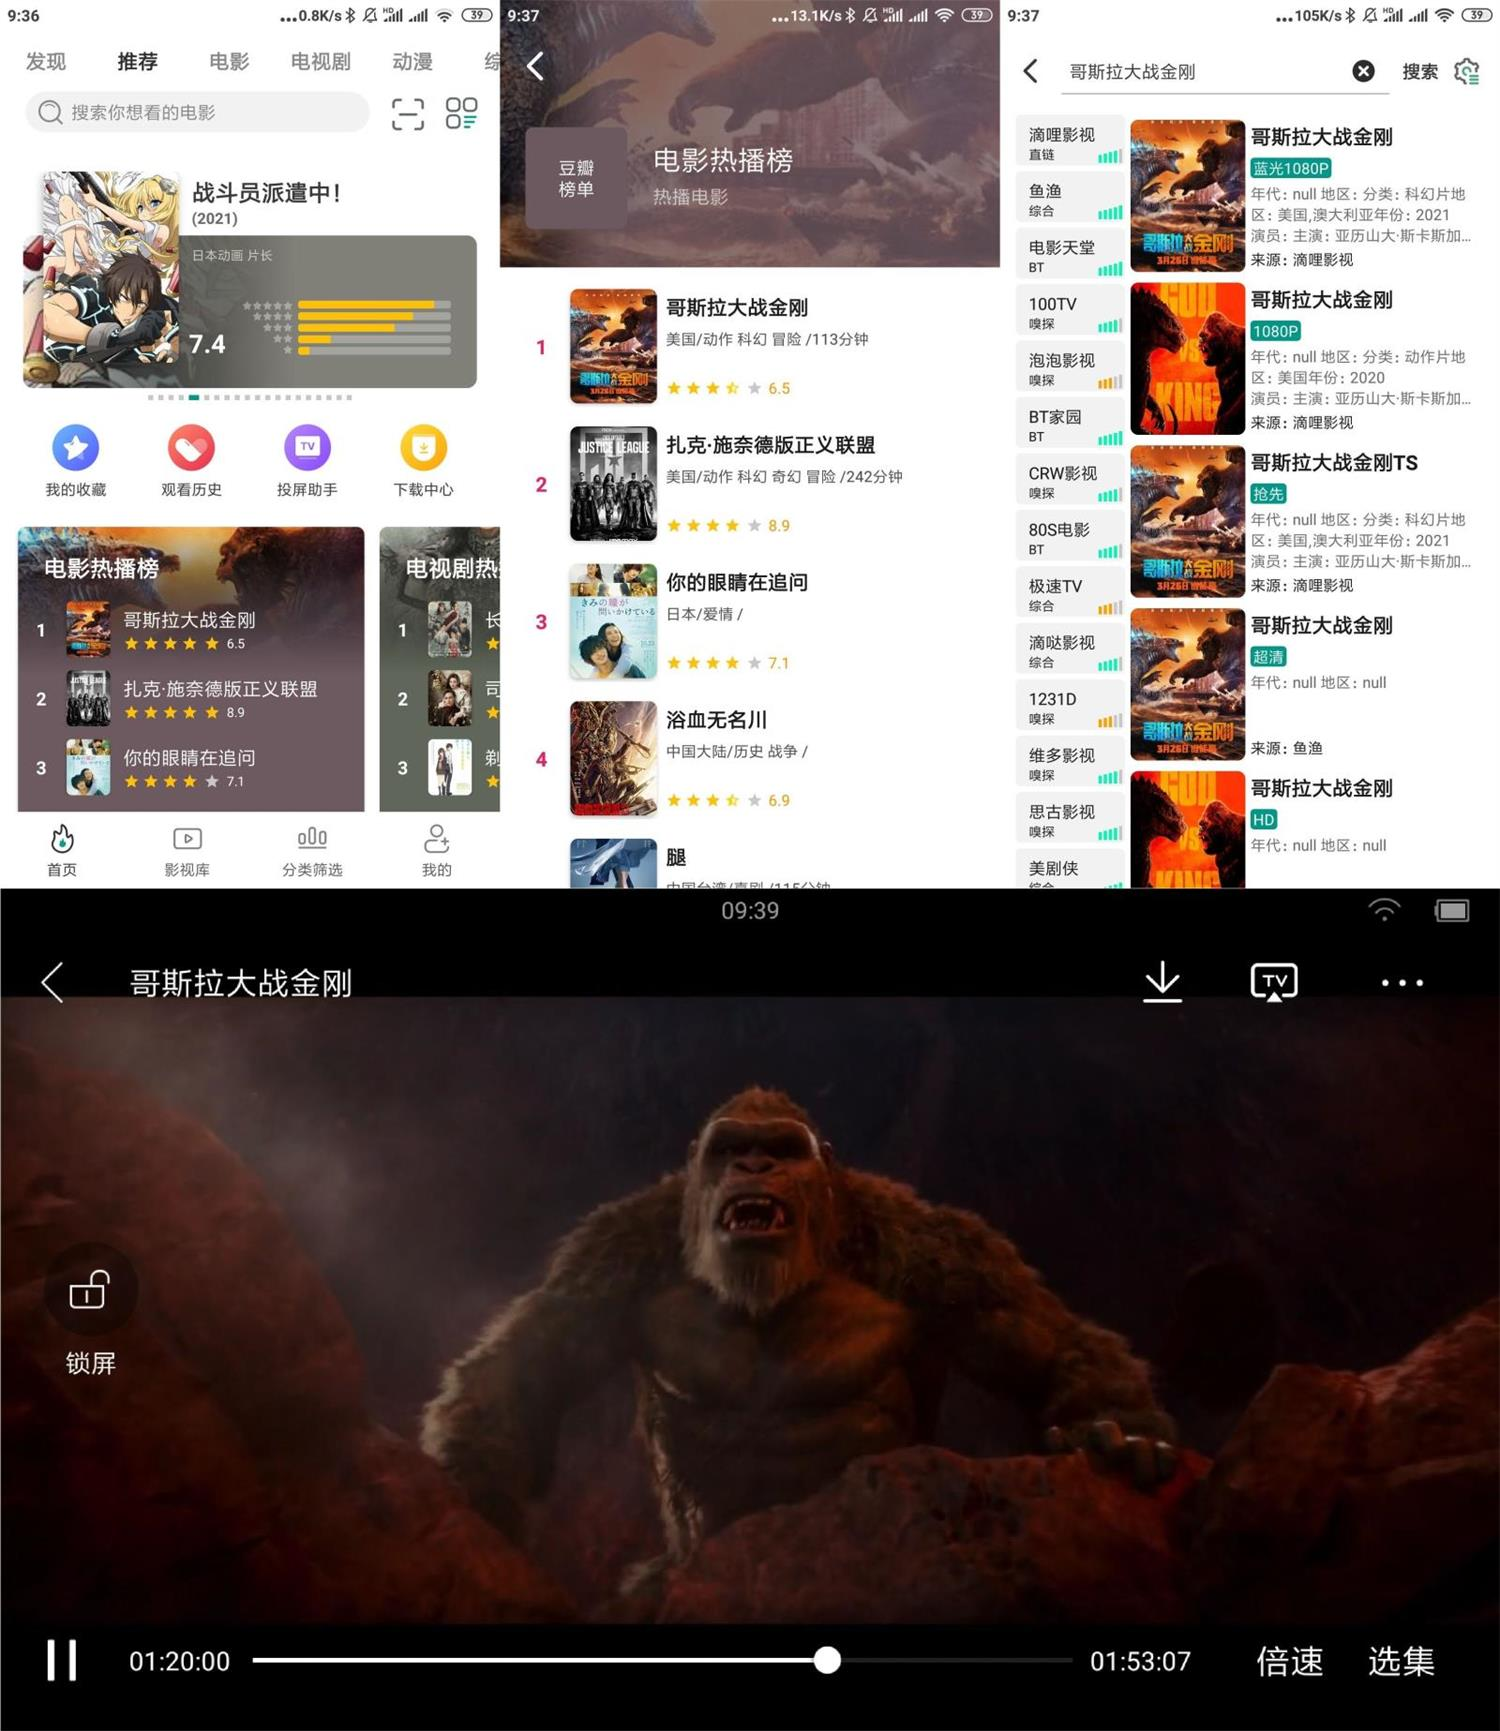 极光影院v2.3.8无广告版 免费追剧